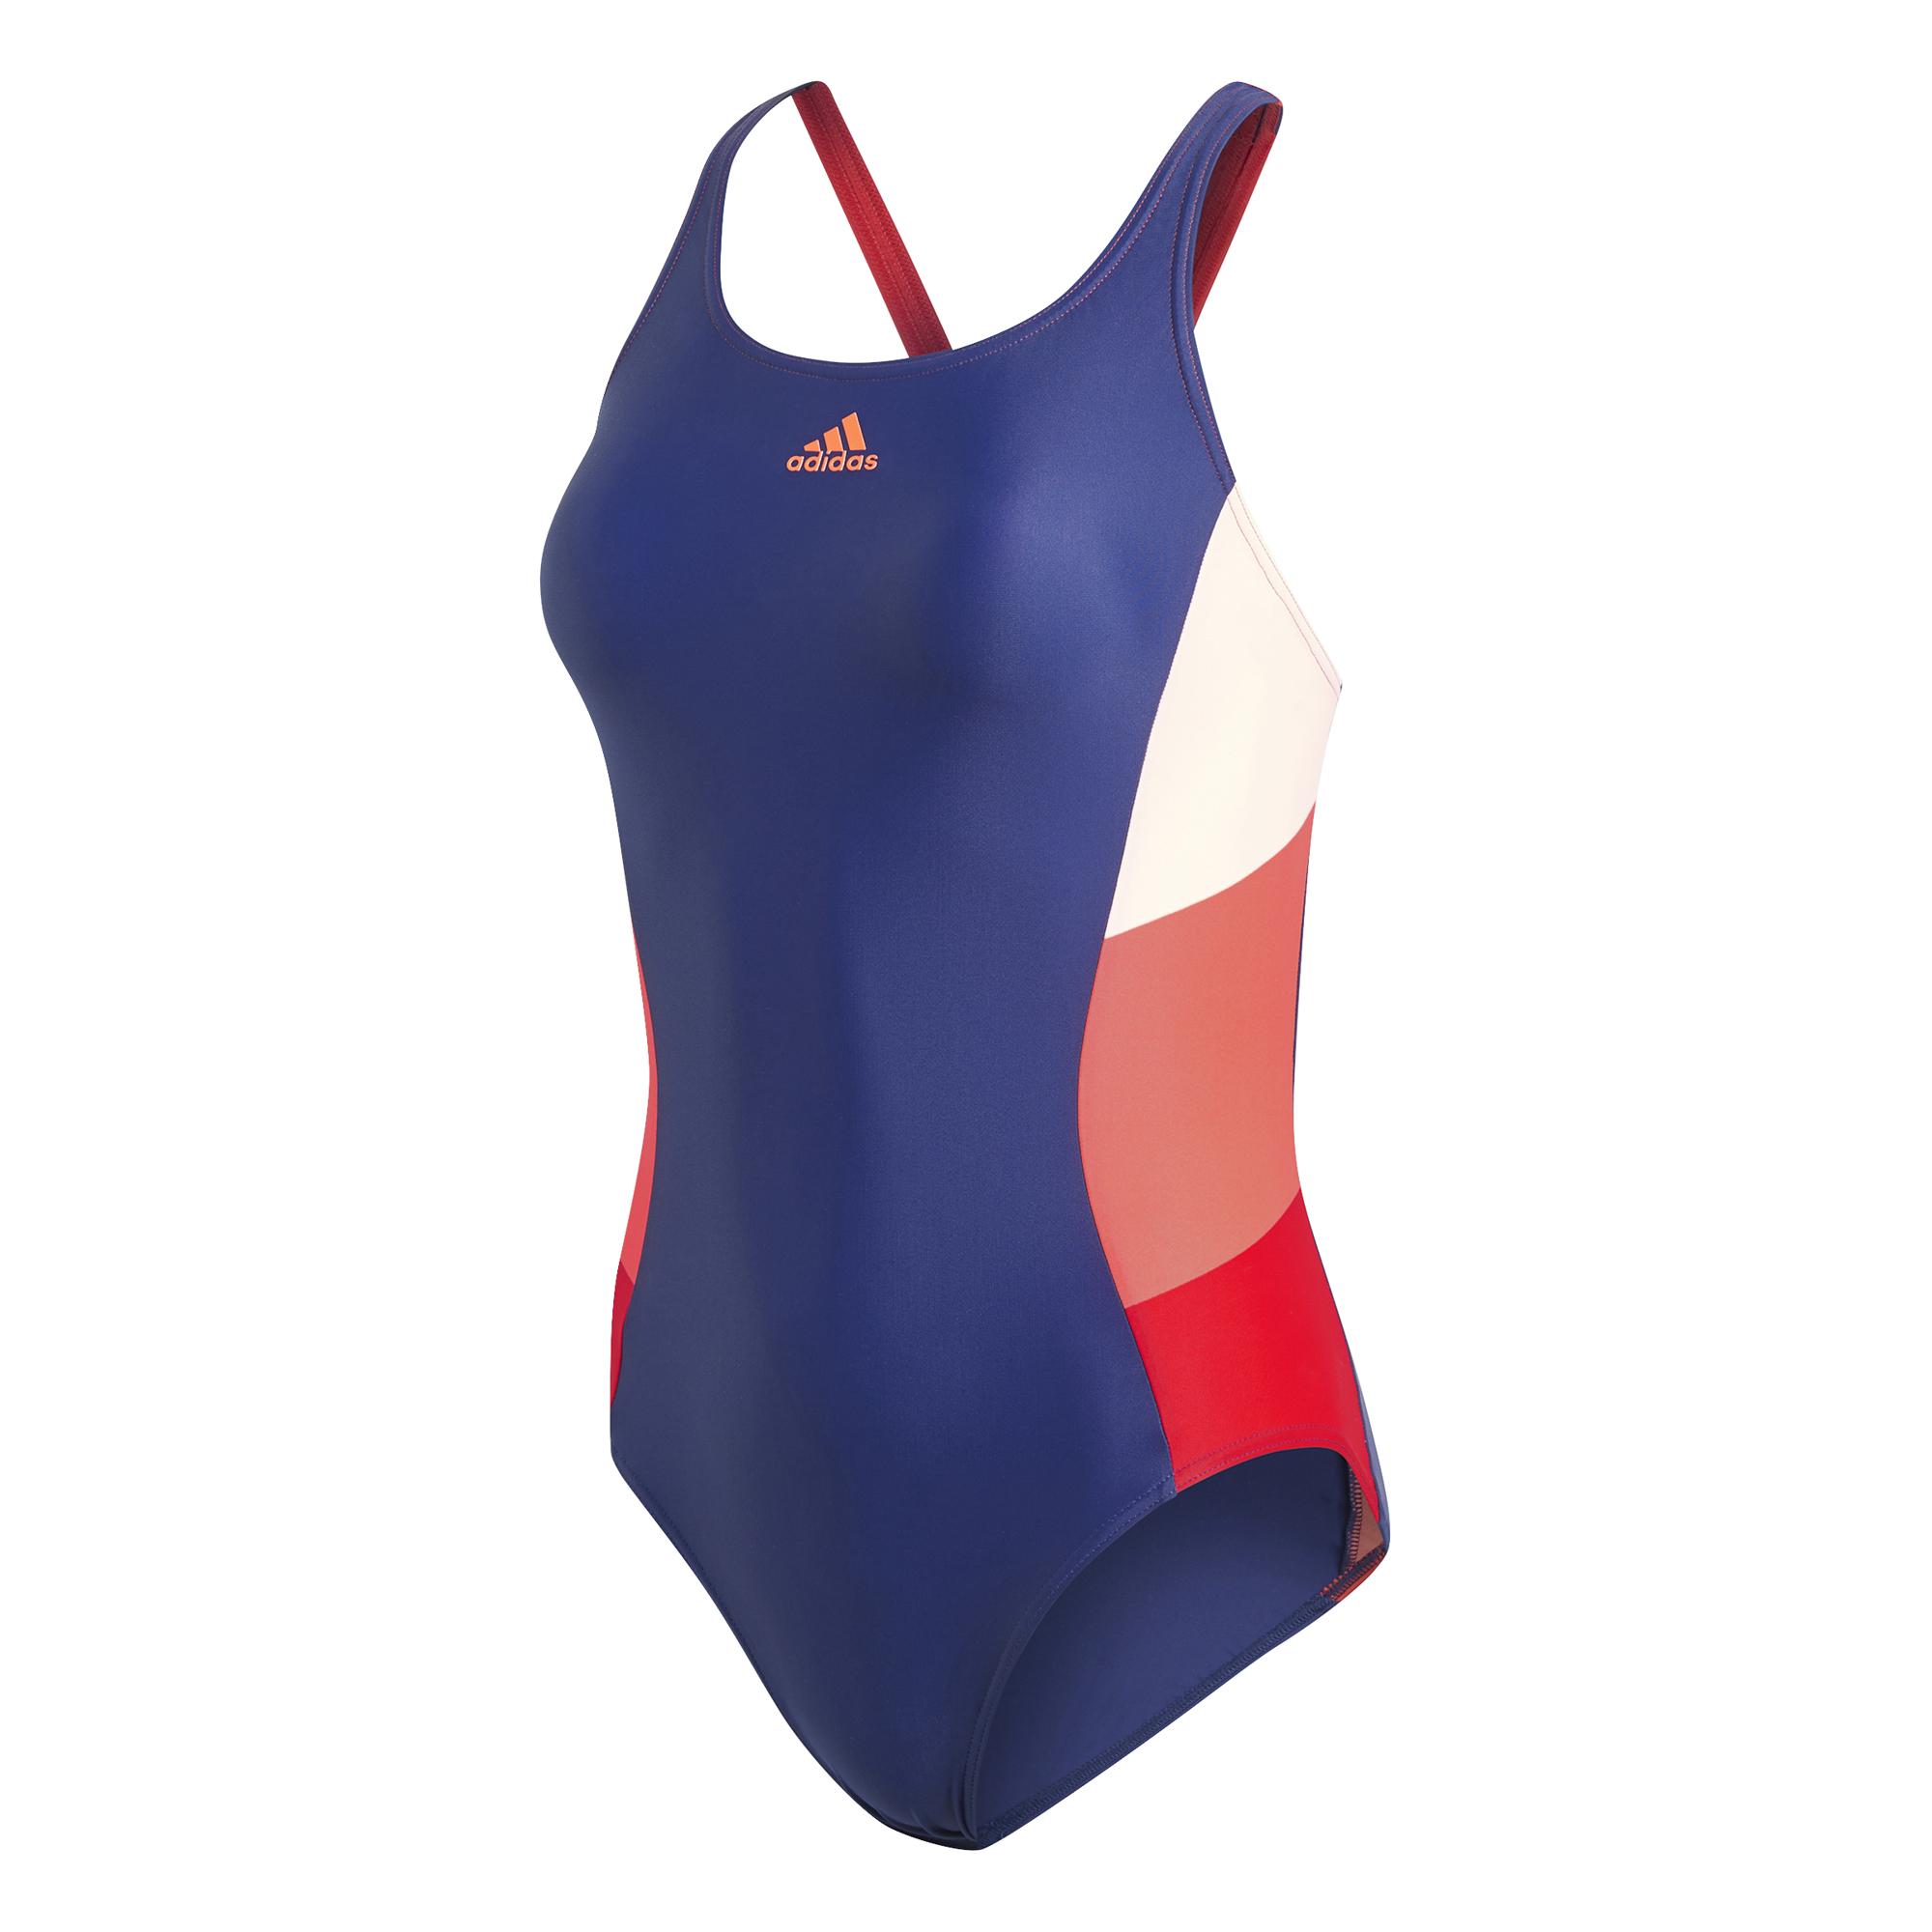 8b3108bc2cf62 strój kąpielowy adidas Athly X Colorblock Swimsuit DH2389 ...